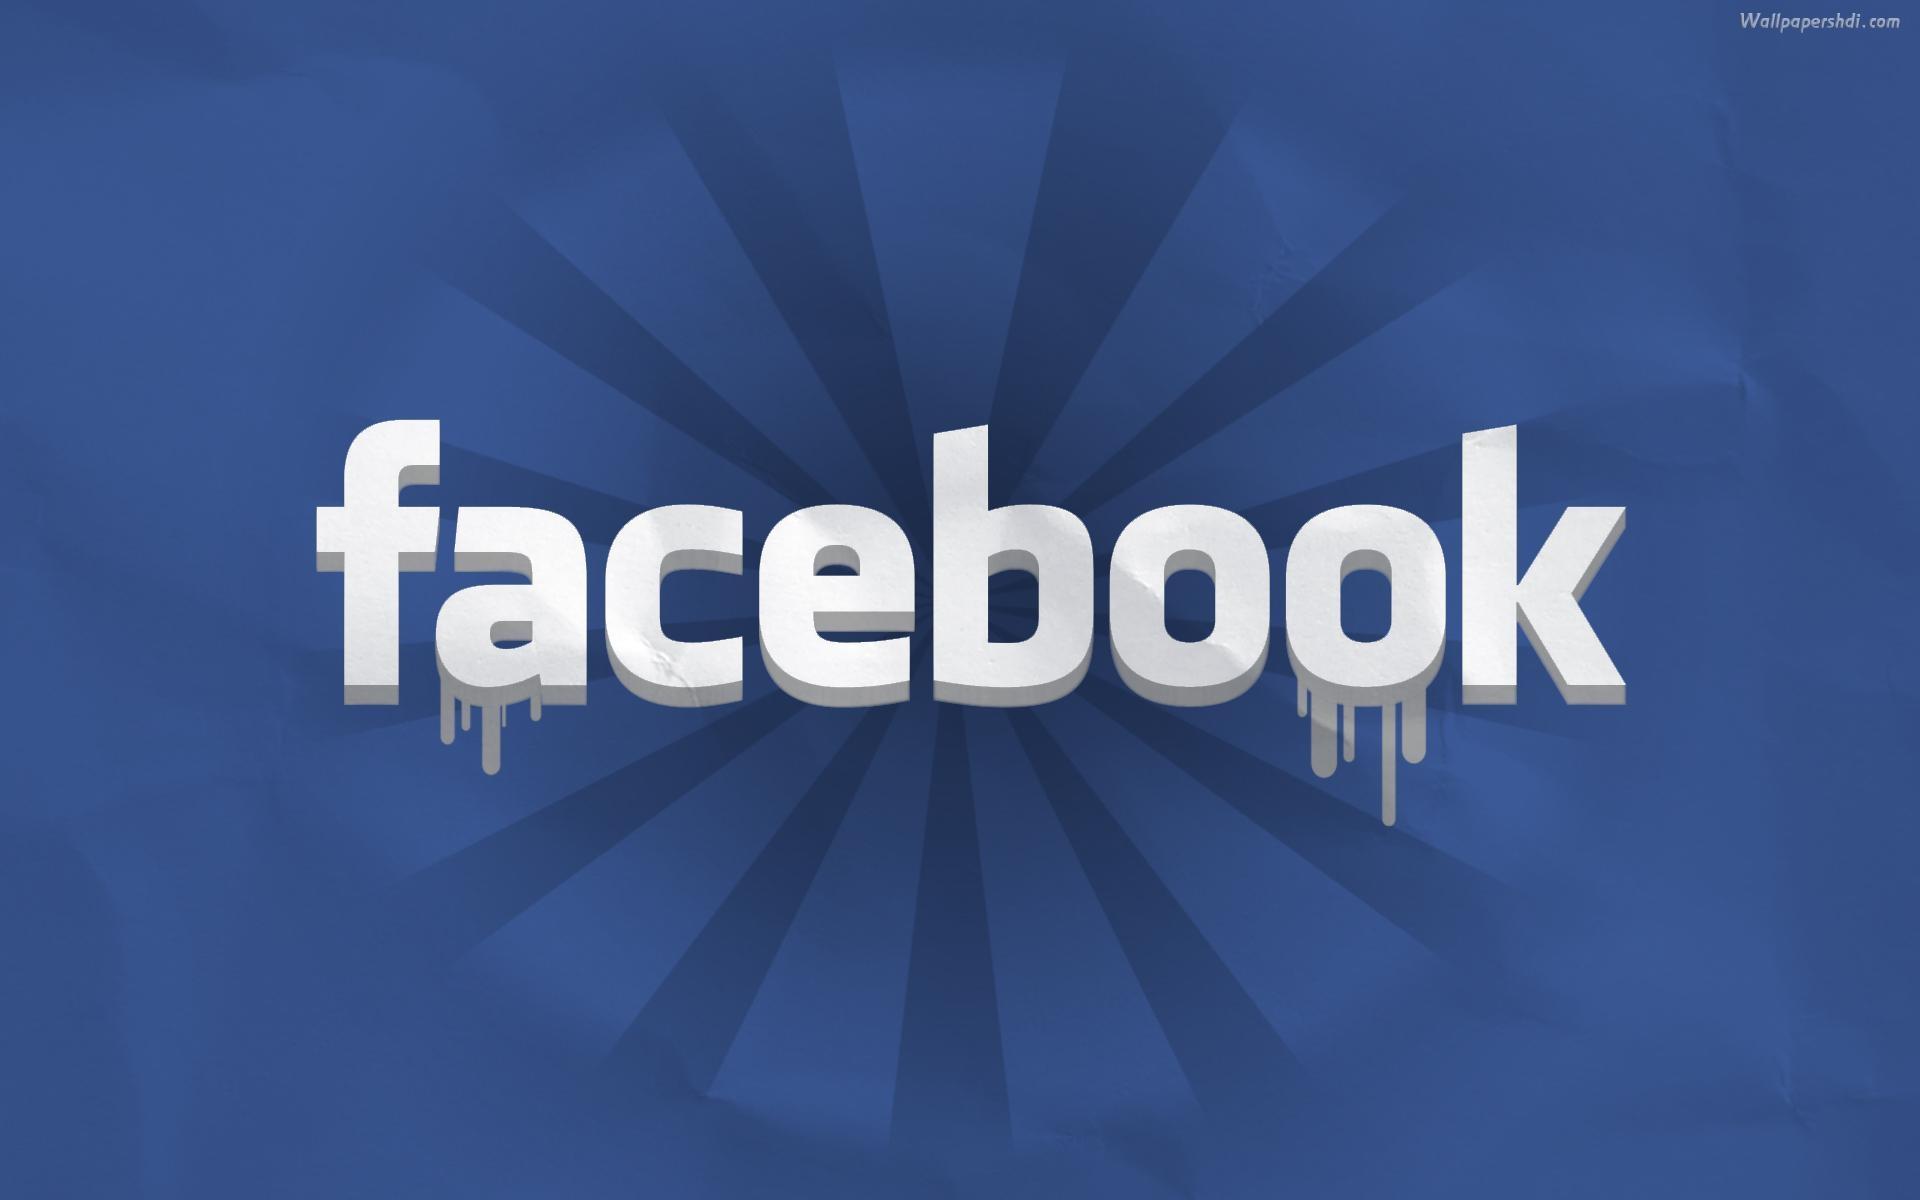 facebookc